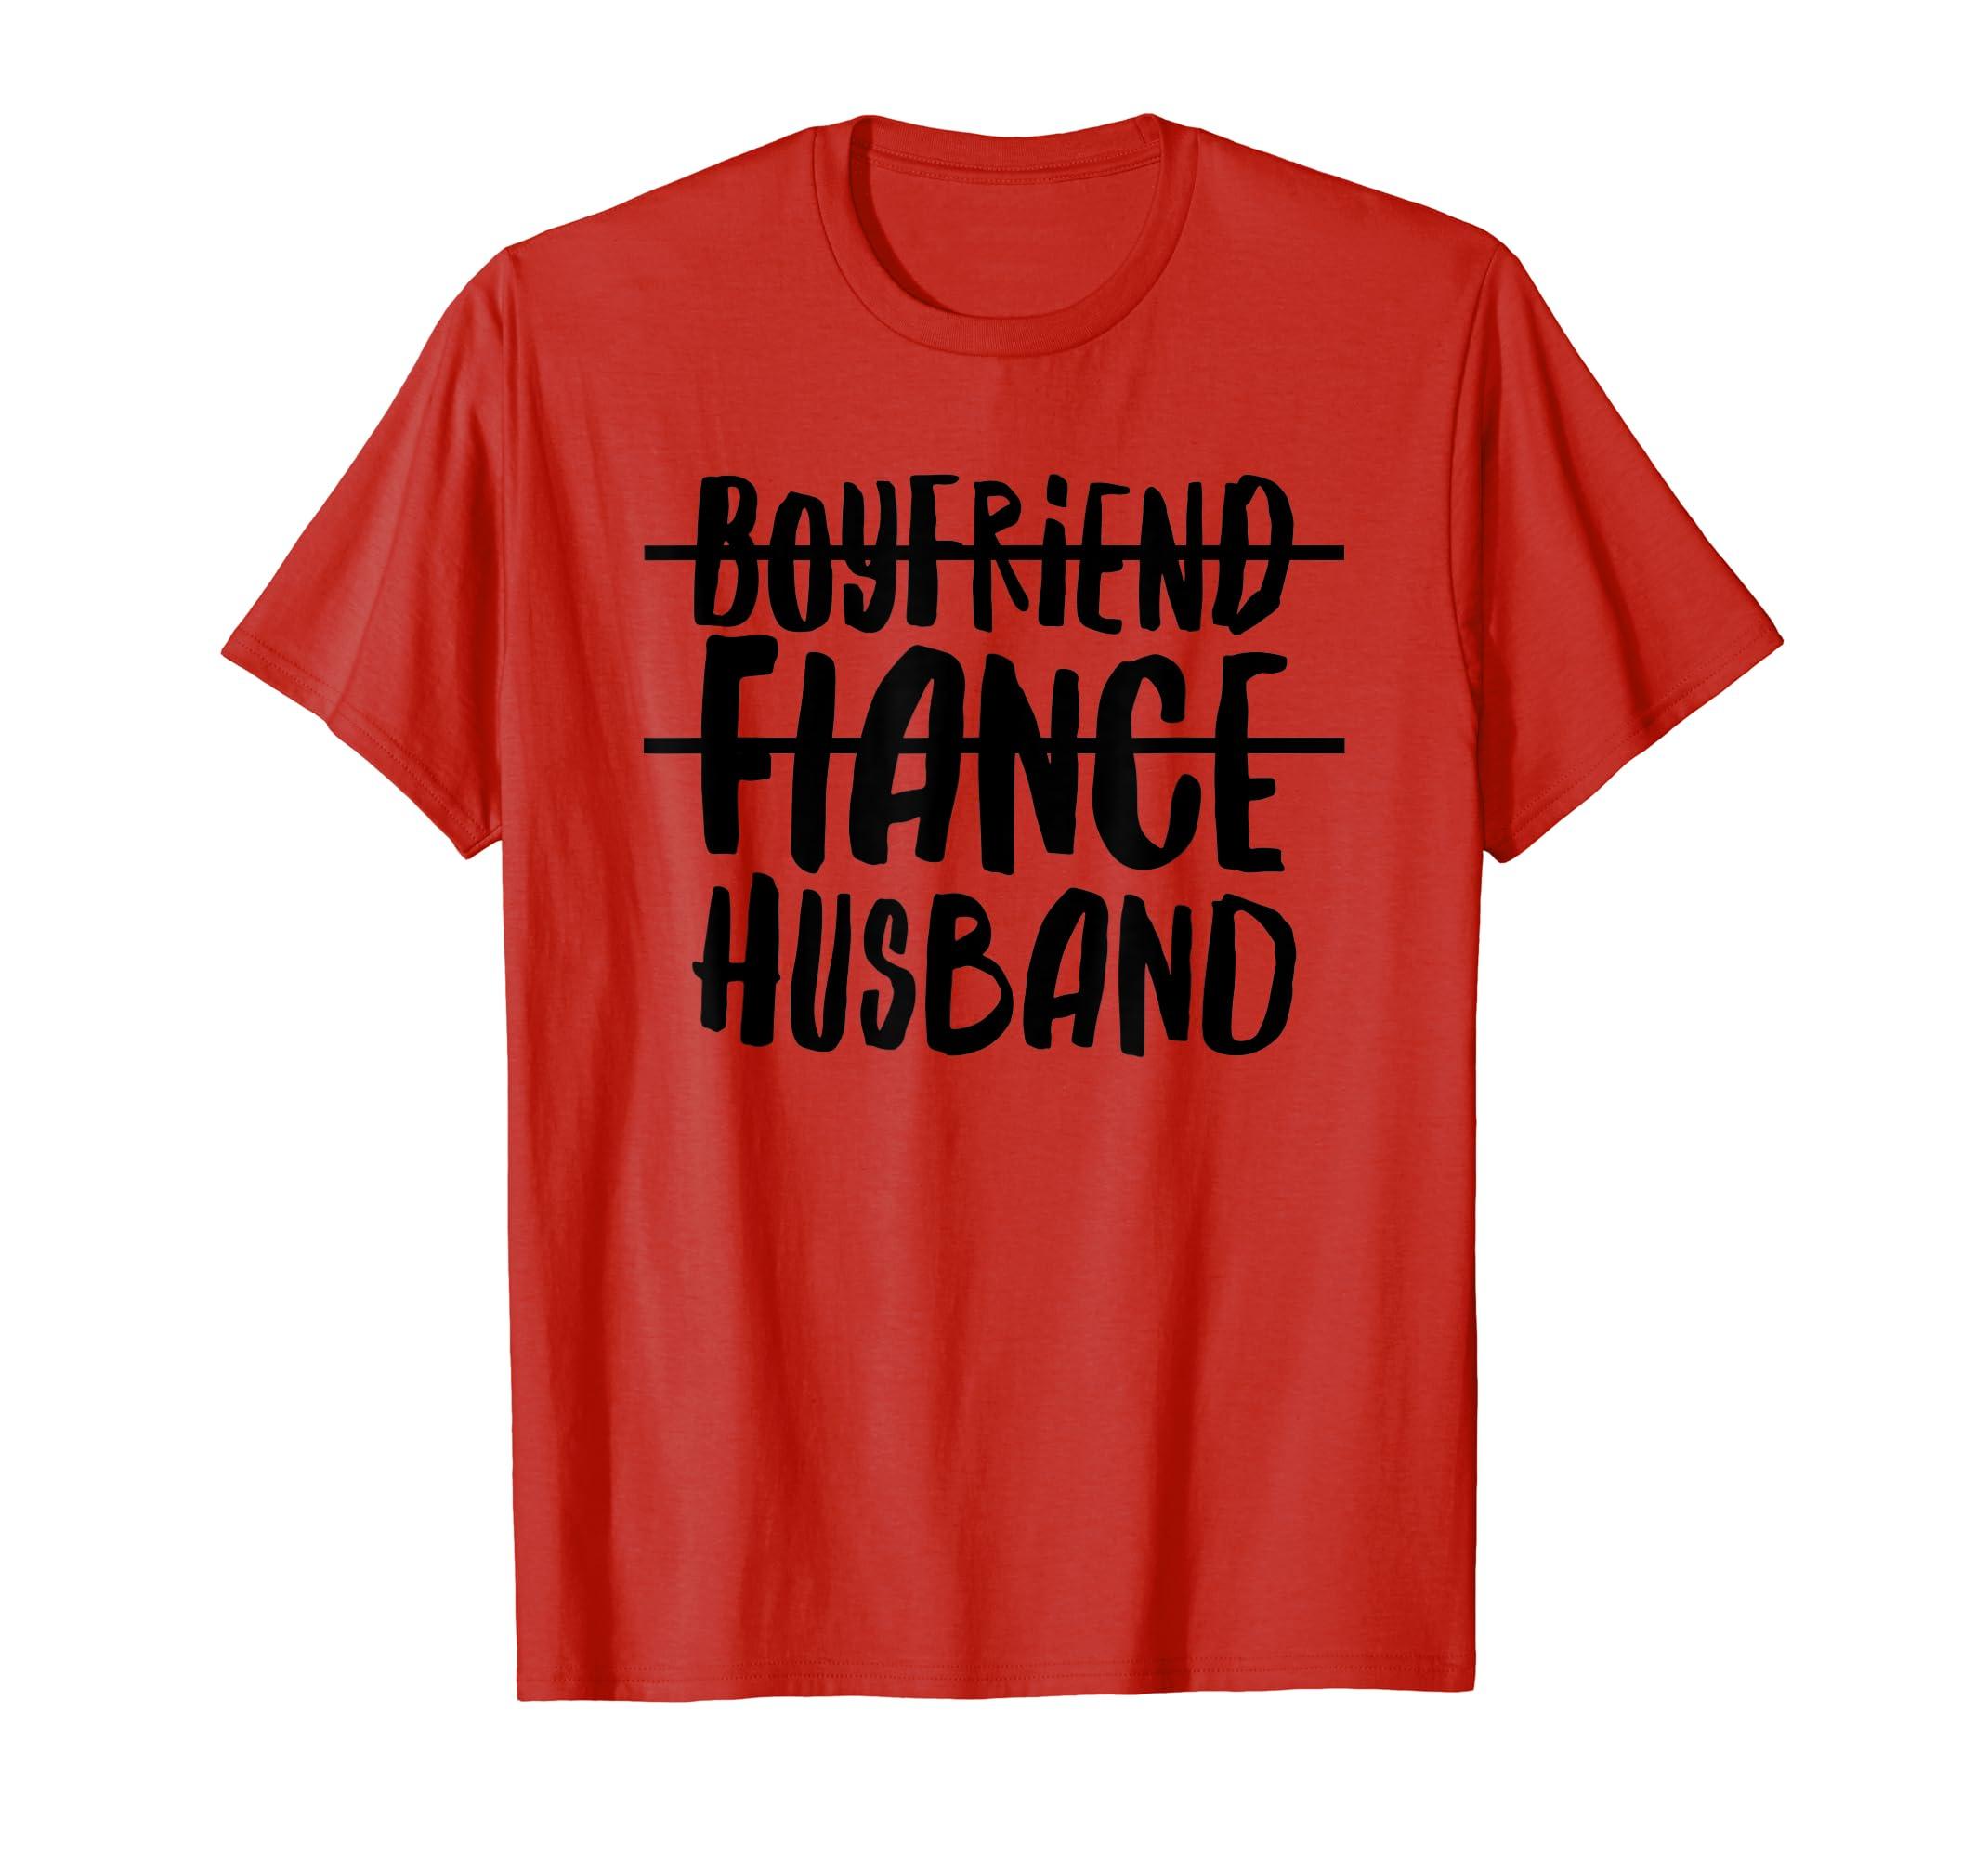 957b38ae Amazon.com: Mens Boyfriend Fiance Husband Funny T-Shirt | Husband Shirt:  Clothing